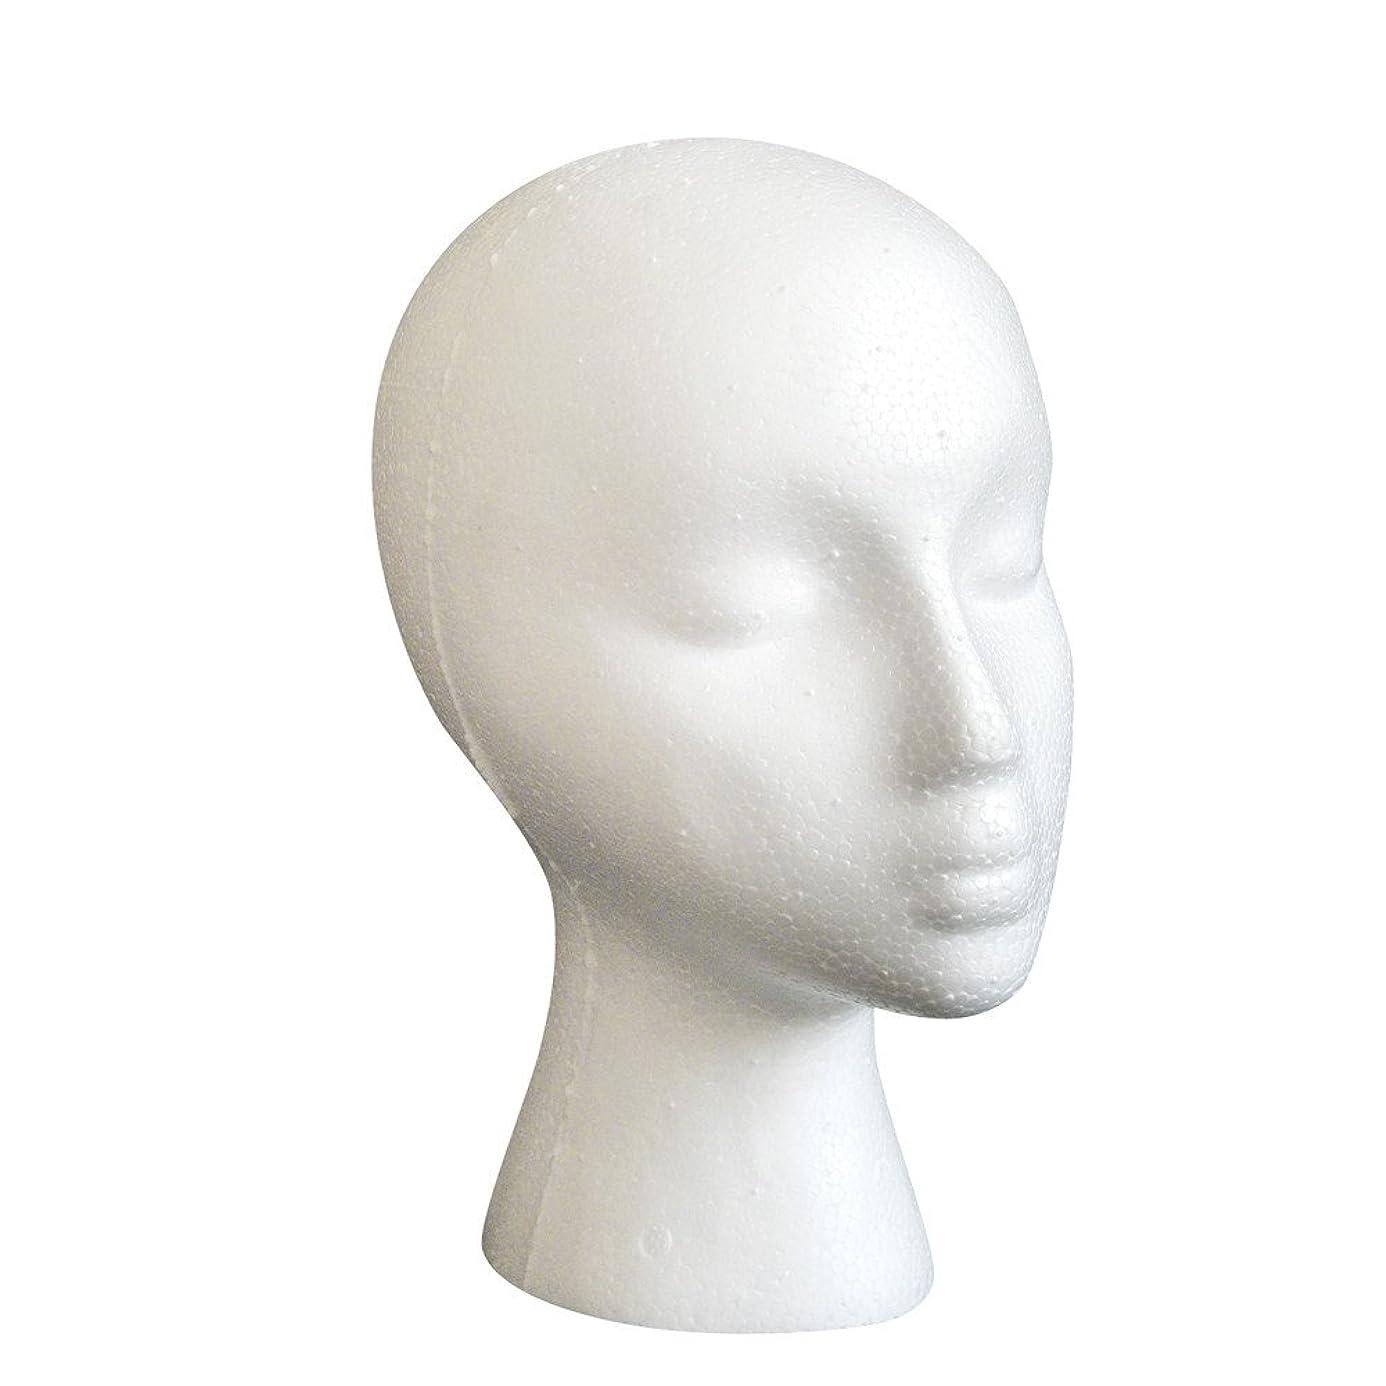 Muranba 2019 ! Styrofoam Foam Mannequin Female Head Model Dummy Wig Glasses Hat Display Stand Black